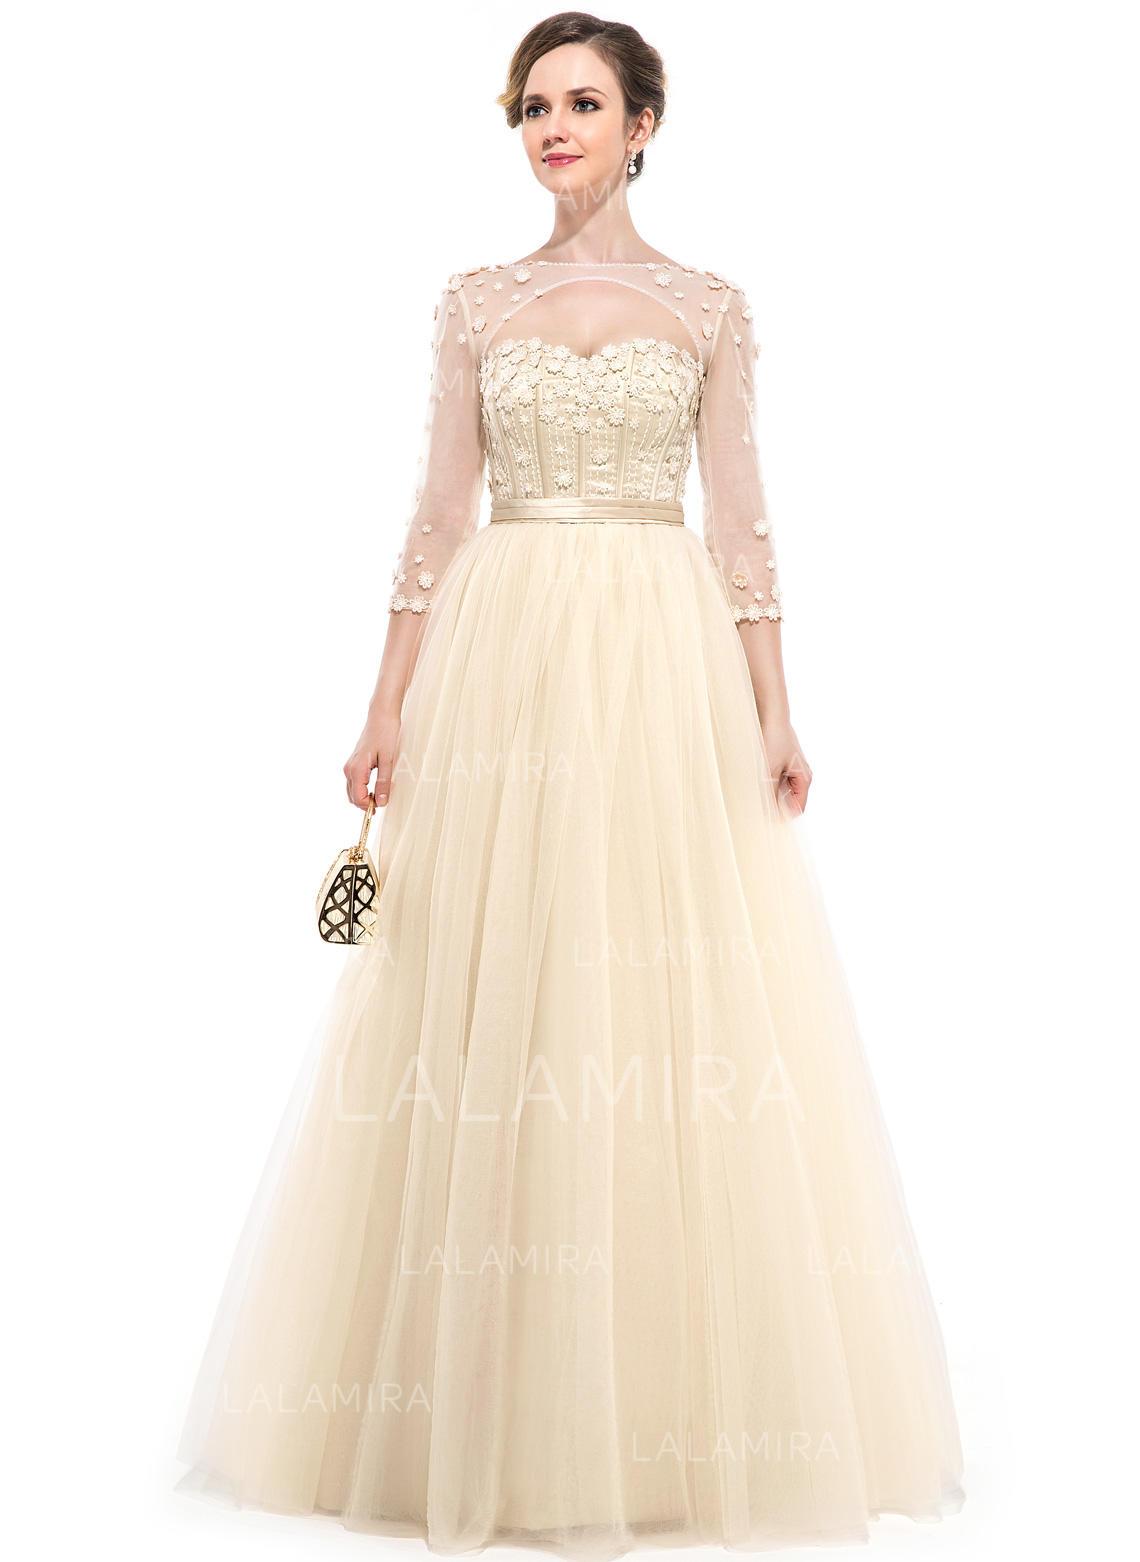 tulle 3/4 sleeves floor-length - ball-gown prom dresses